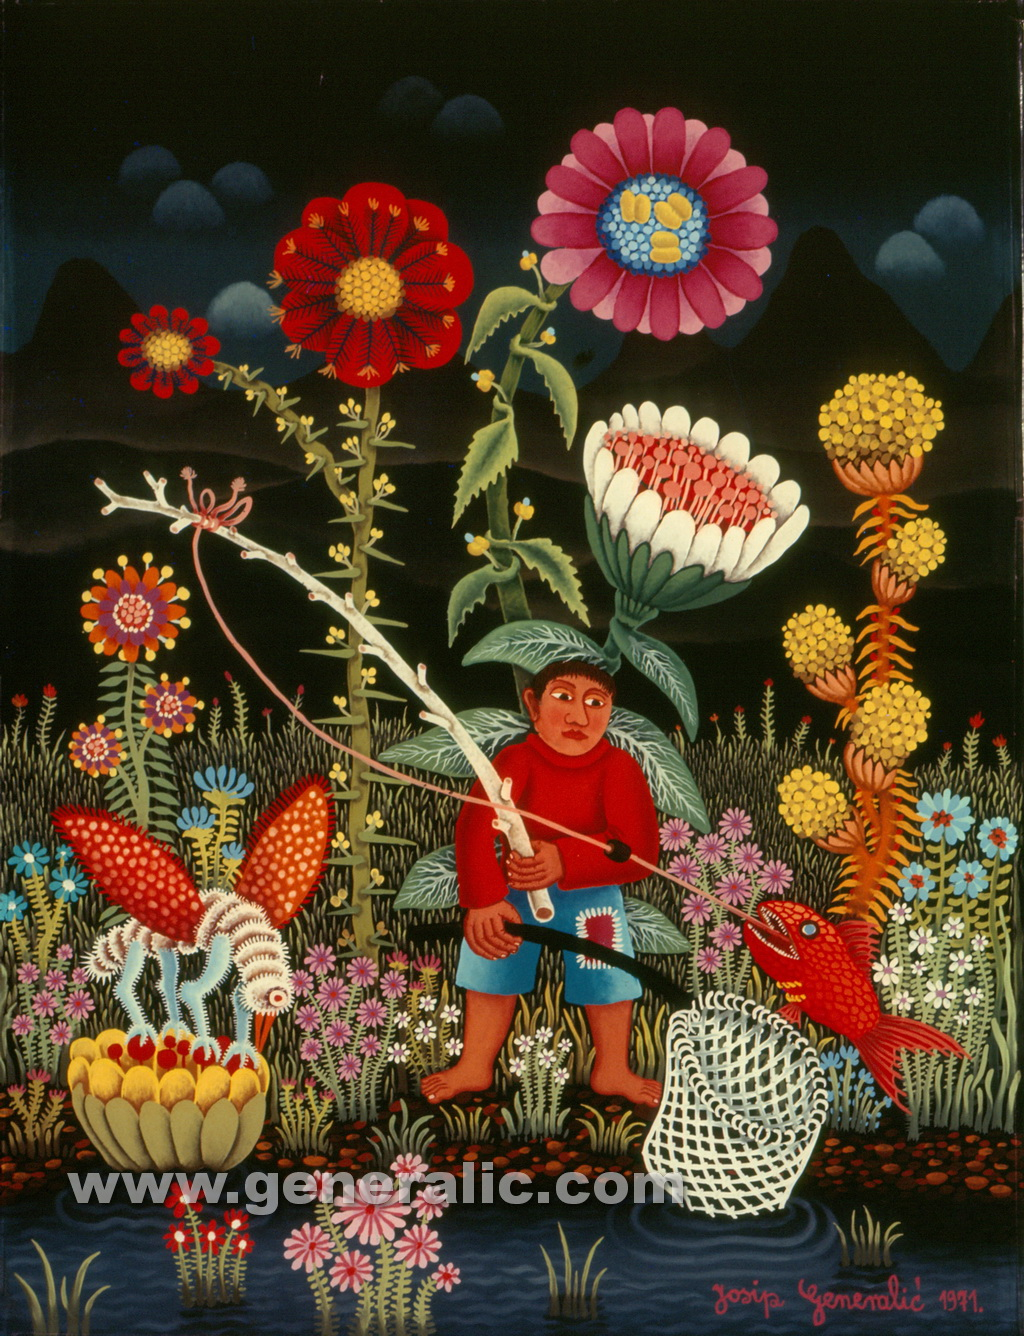 Josip Generalic, 1971, Fishing in fantasy land, oil on glass